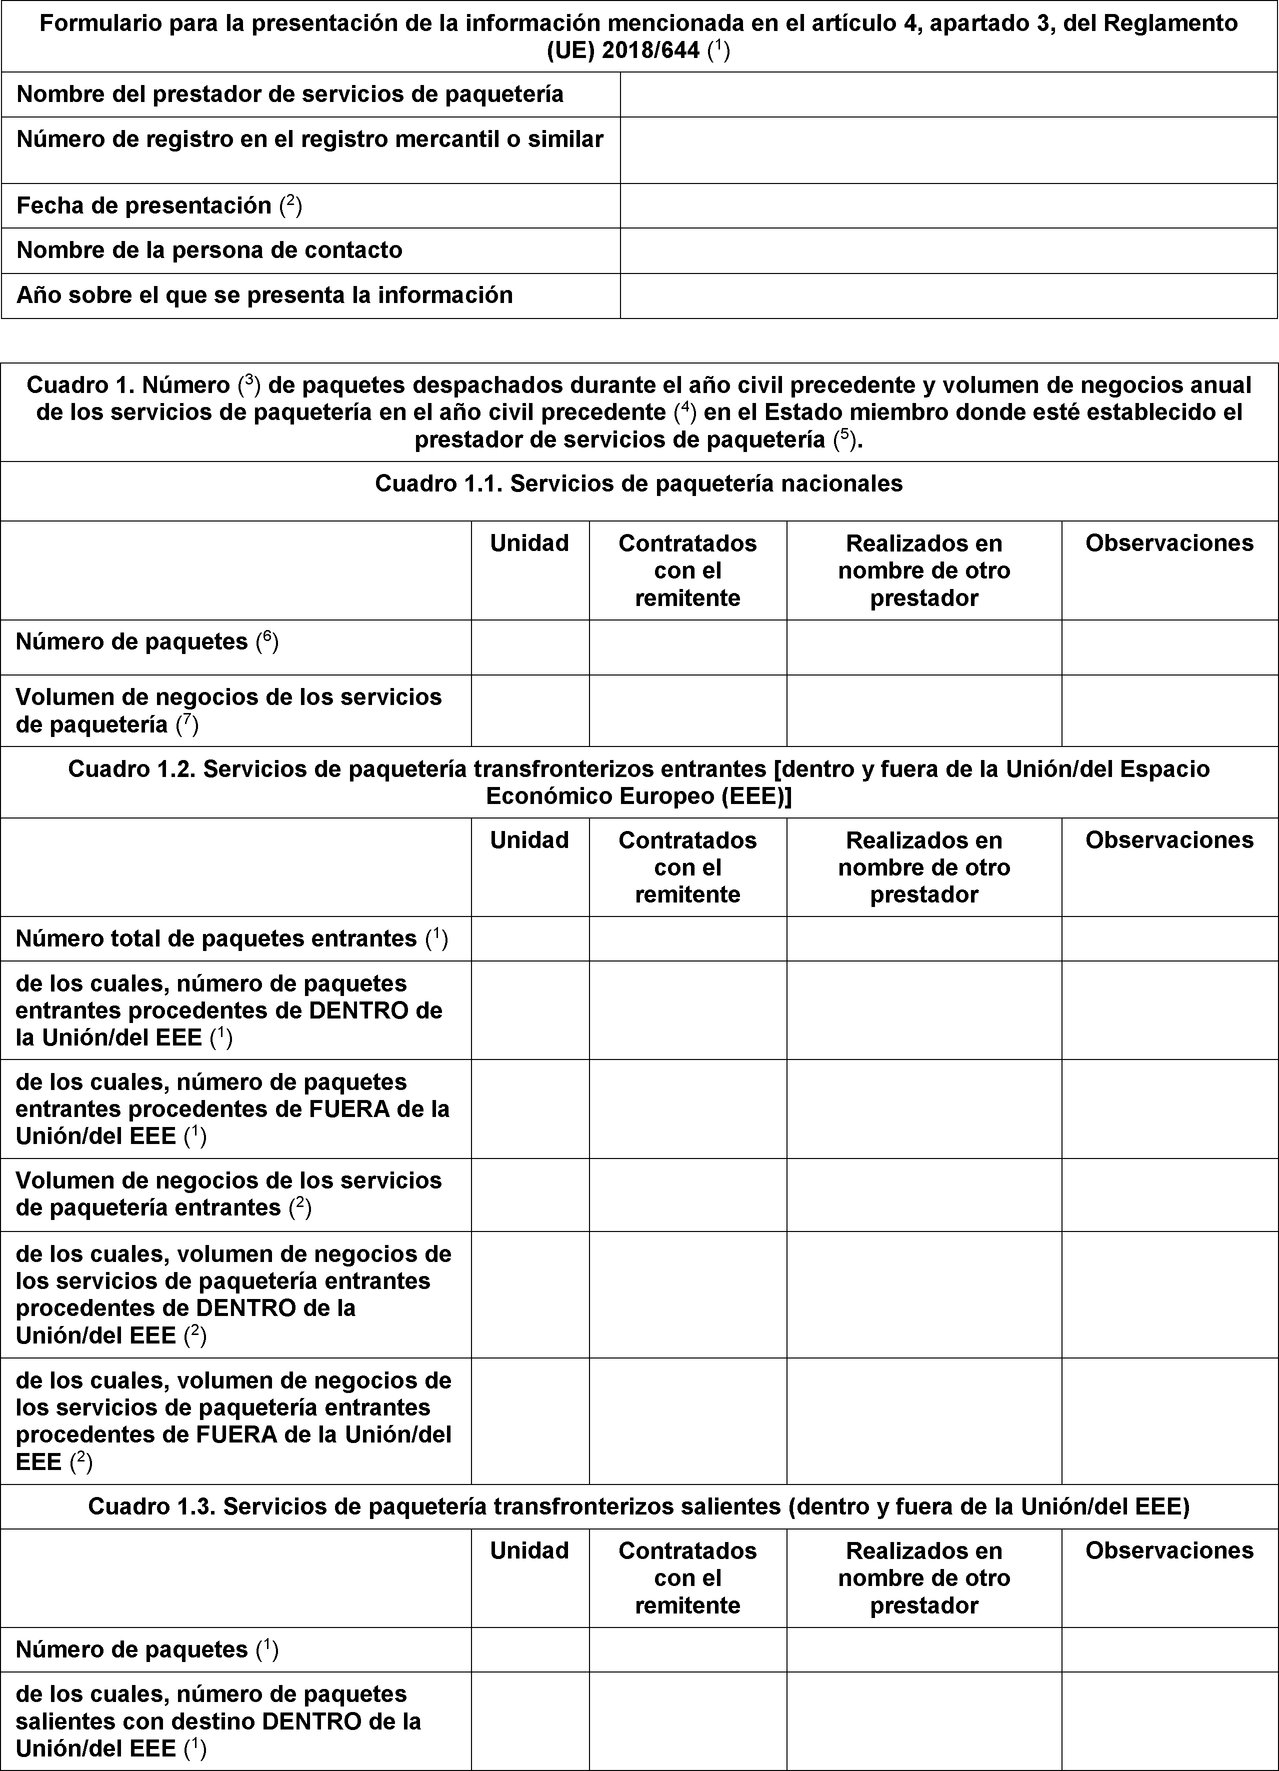 Imagen: https://eur-lex.europa.eu/resource.html?uri=uriserv:OJ.L_.2018.238.01.0065.01.SPA.xhtml.L_2018238ES.01006802.tif.jpg